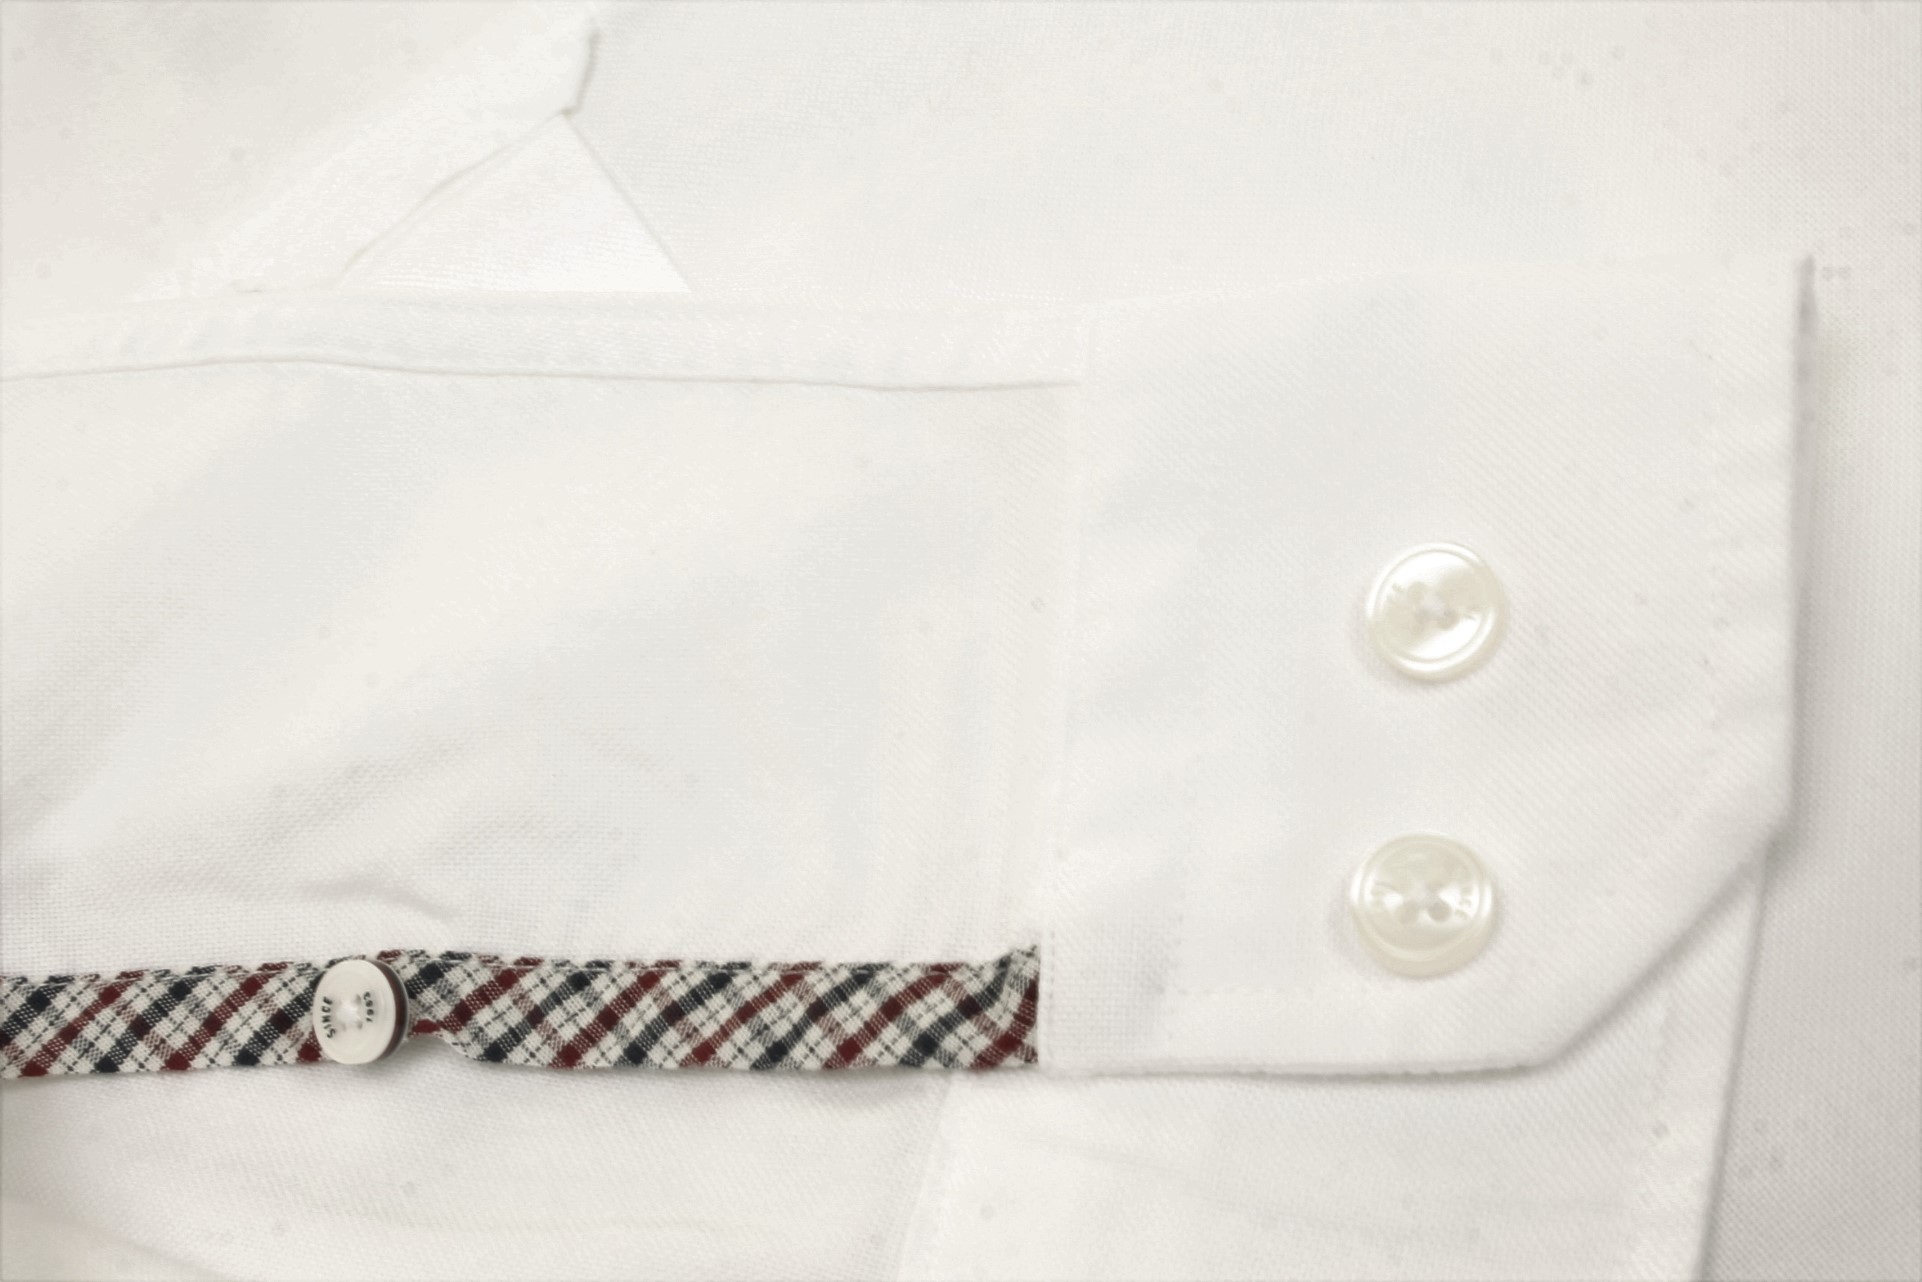 Mens-Oxford-Shirt-by-Ben-Sherman-Long-Sleeved thumbnail 47